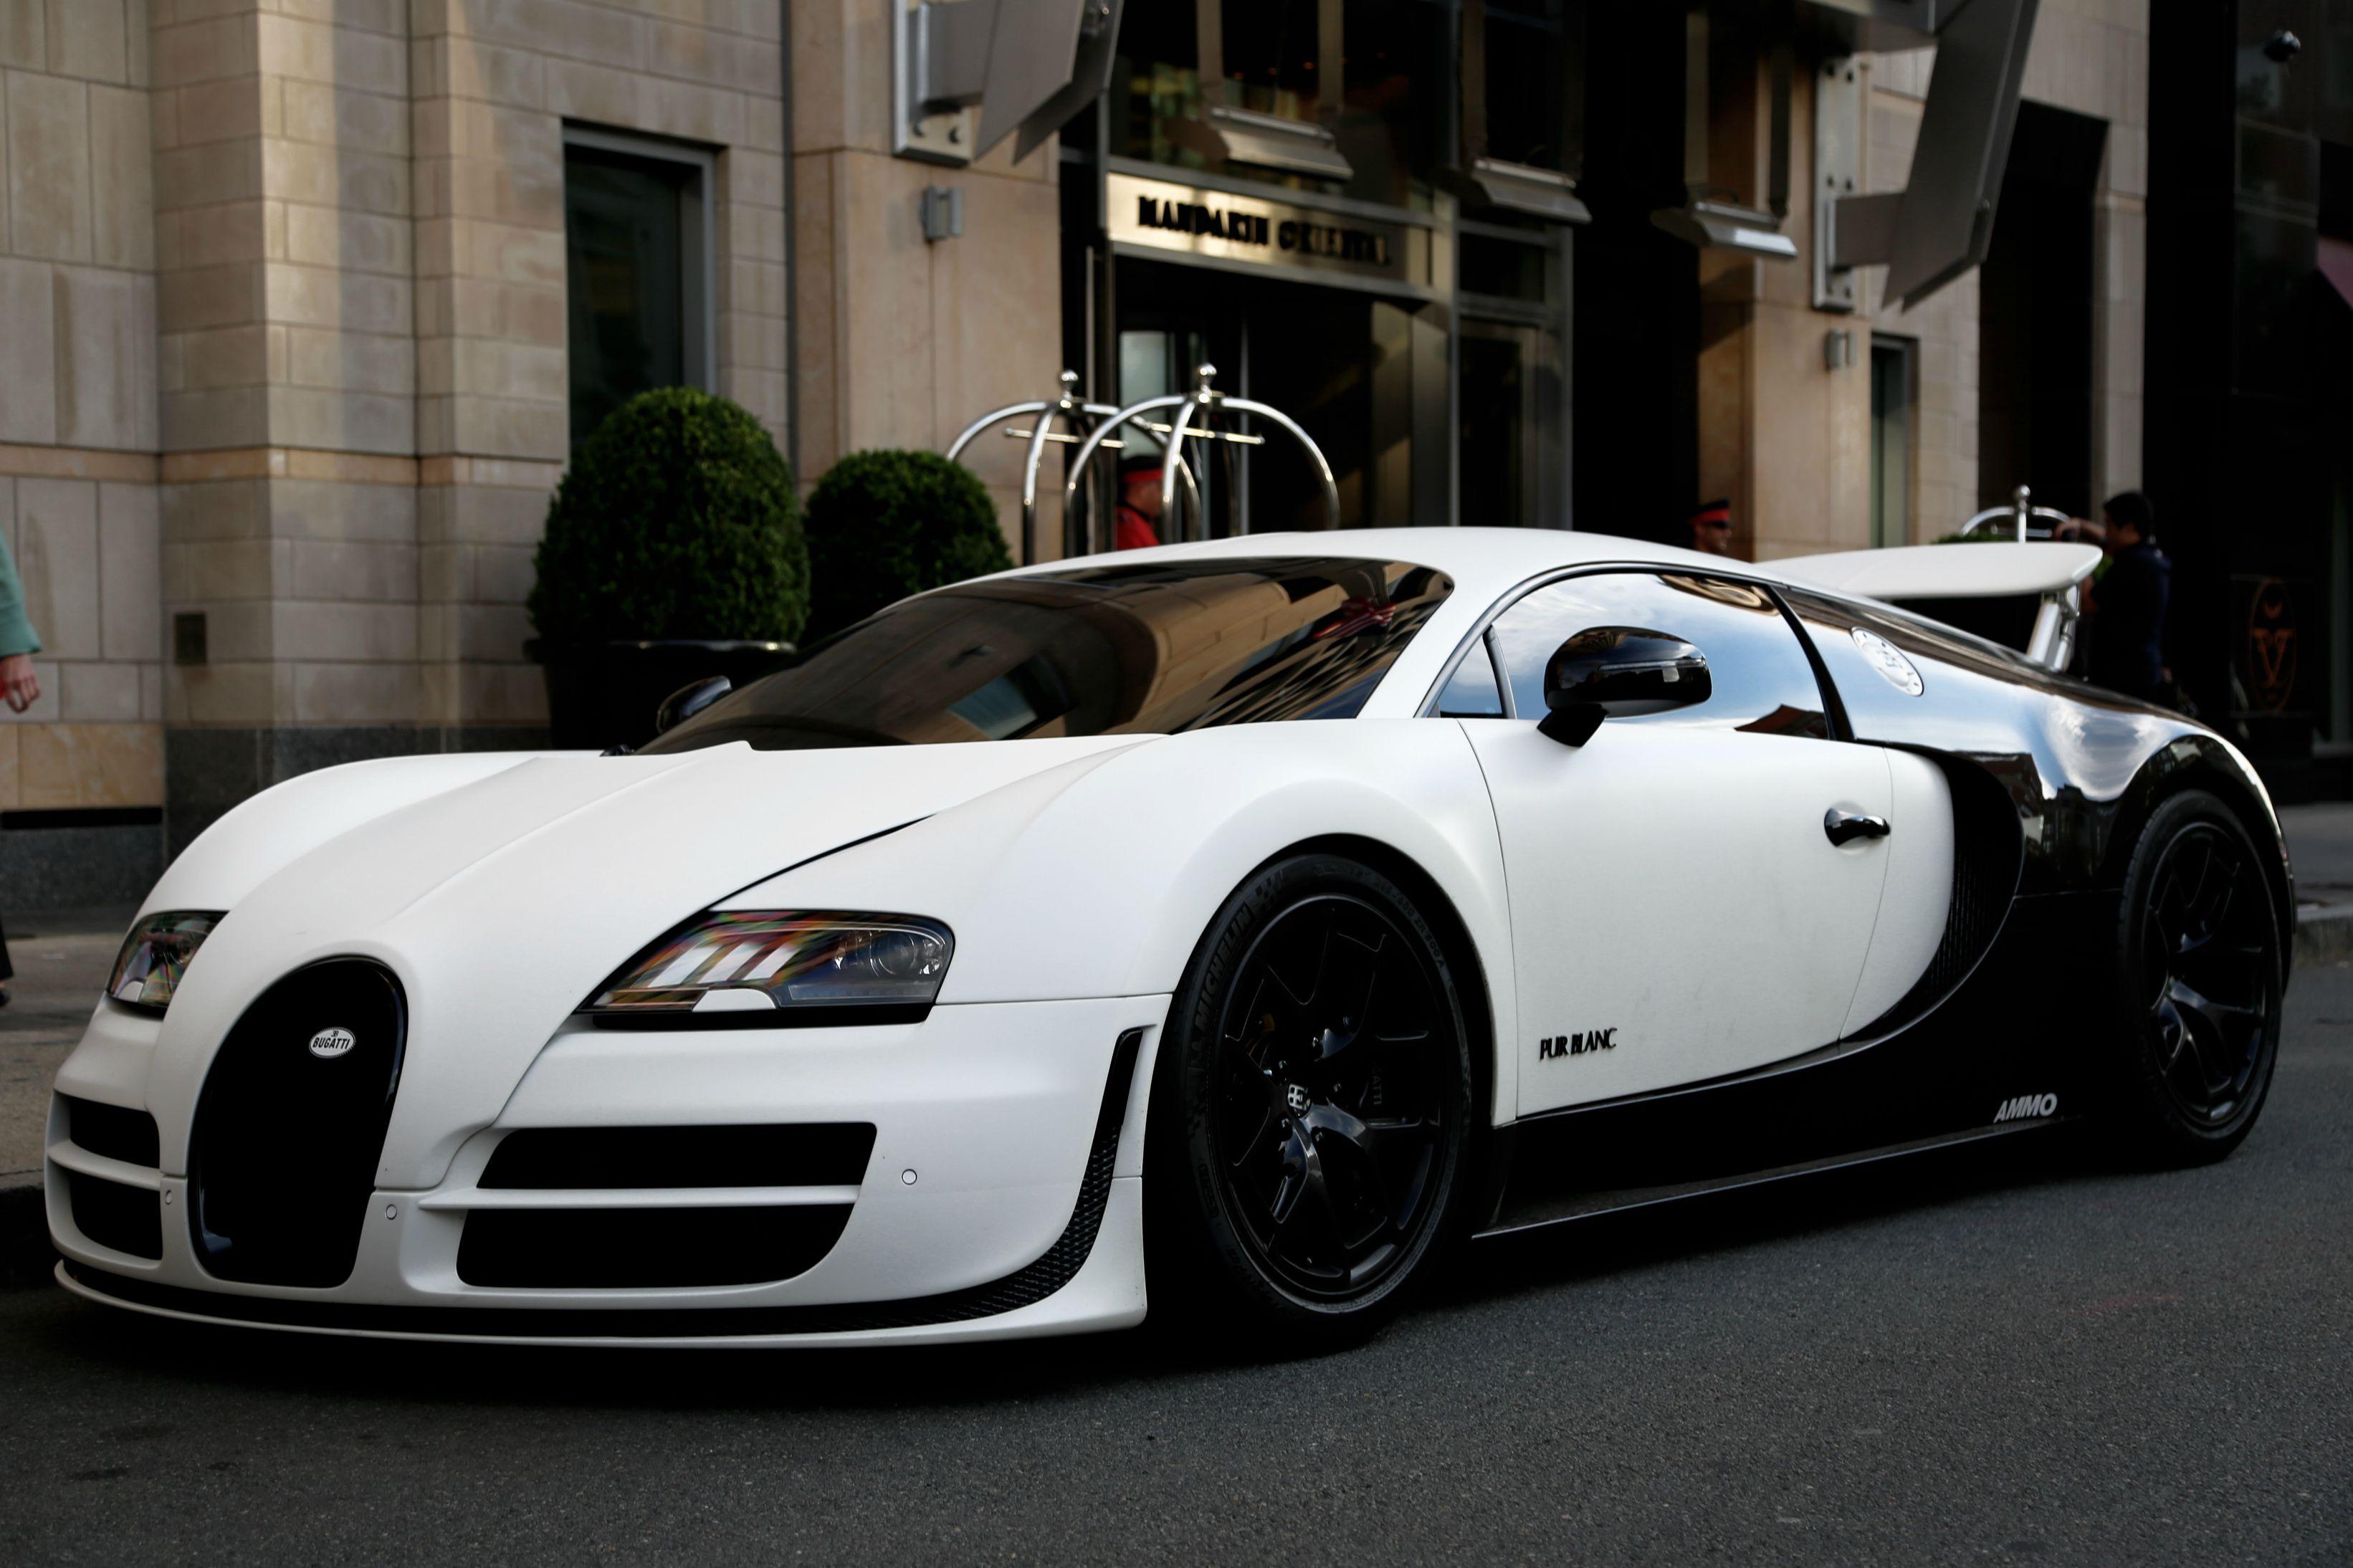 1/1 Bugatti Veyron Super Sport Pur Blance | Cars ...